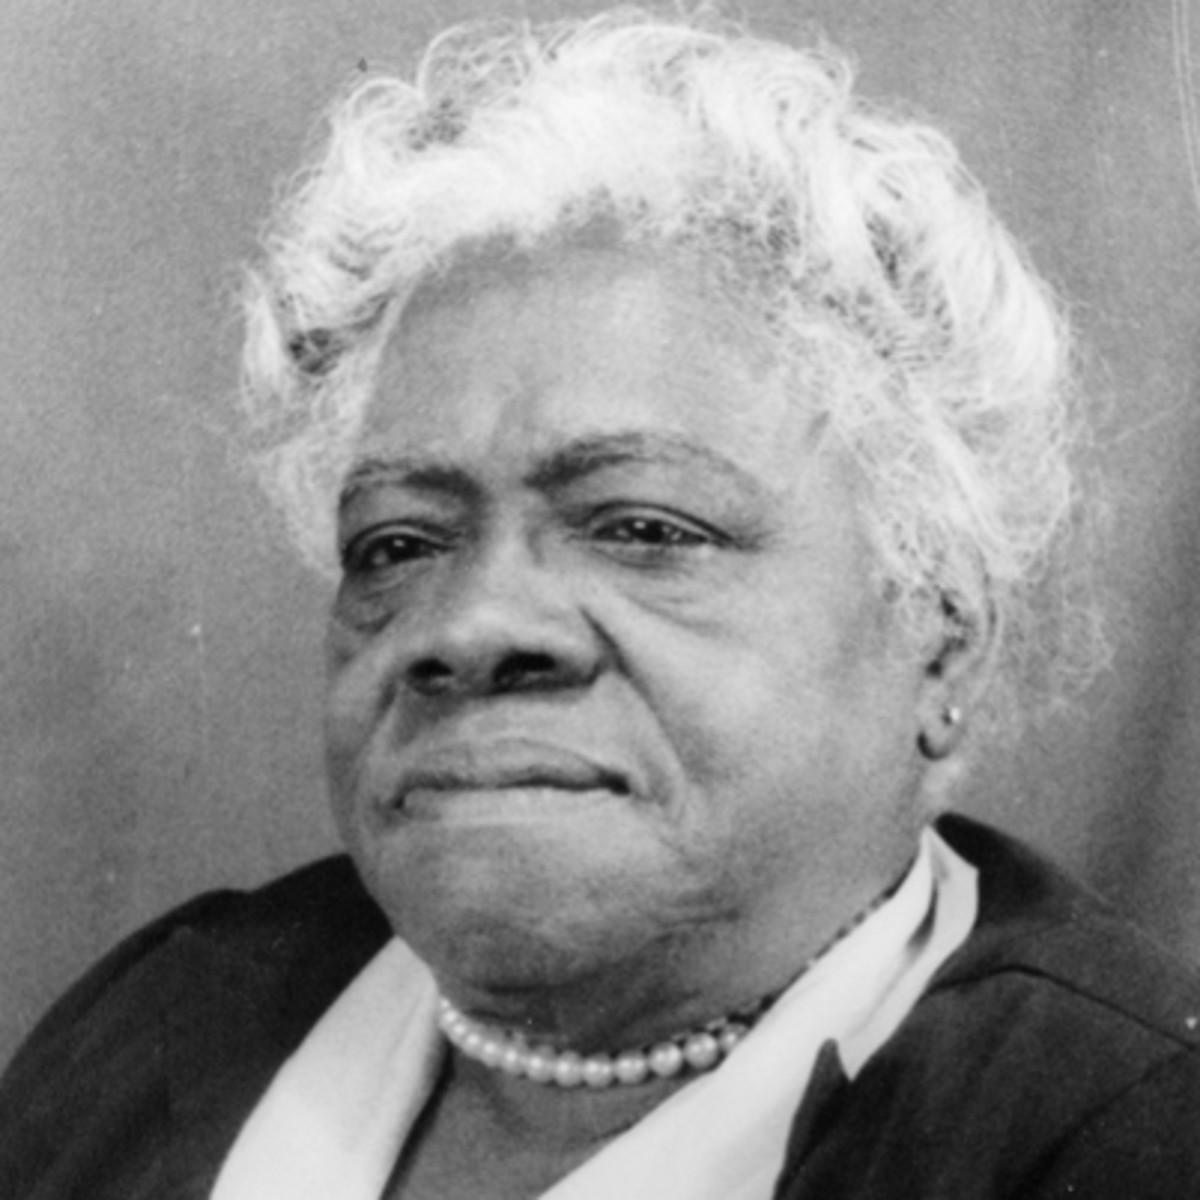 Mary McLeod Bethune - Facts, Education & Accomplishments - Biography